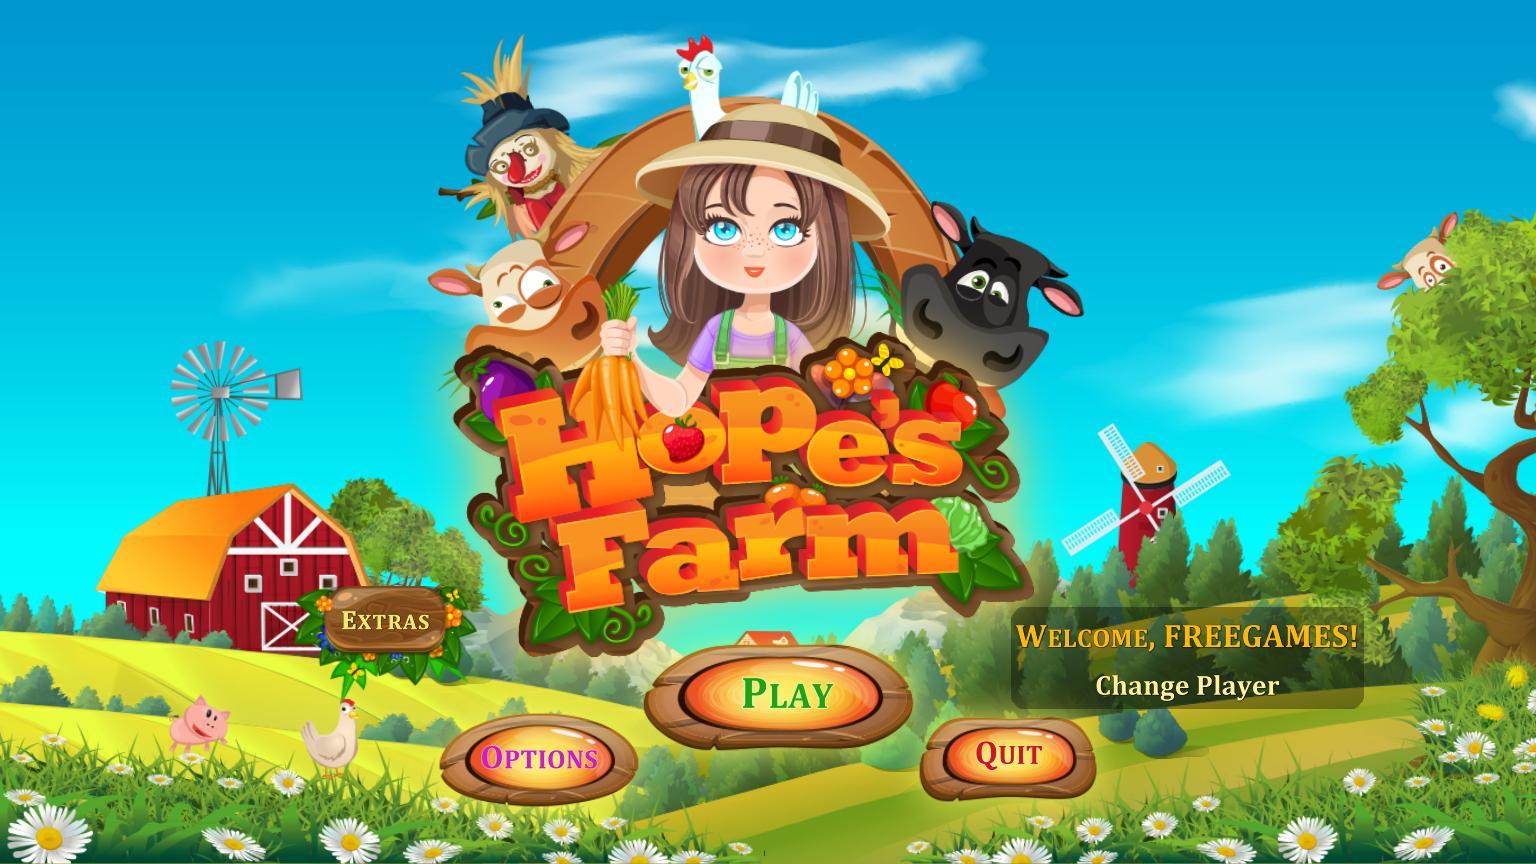 Ферма надежды | Hope's Farm (En)